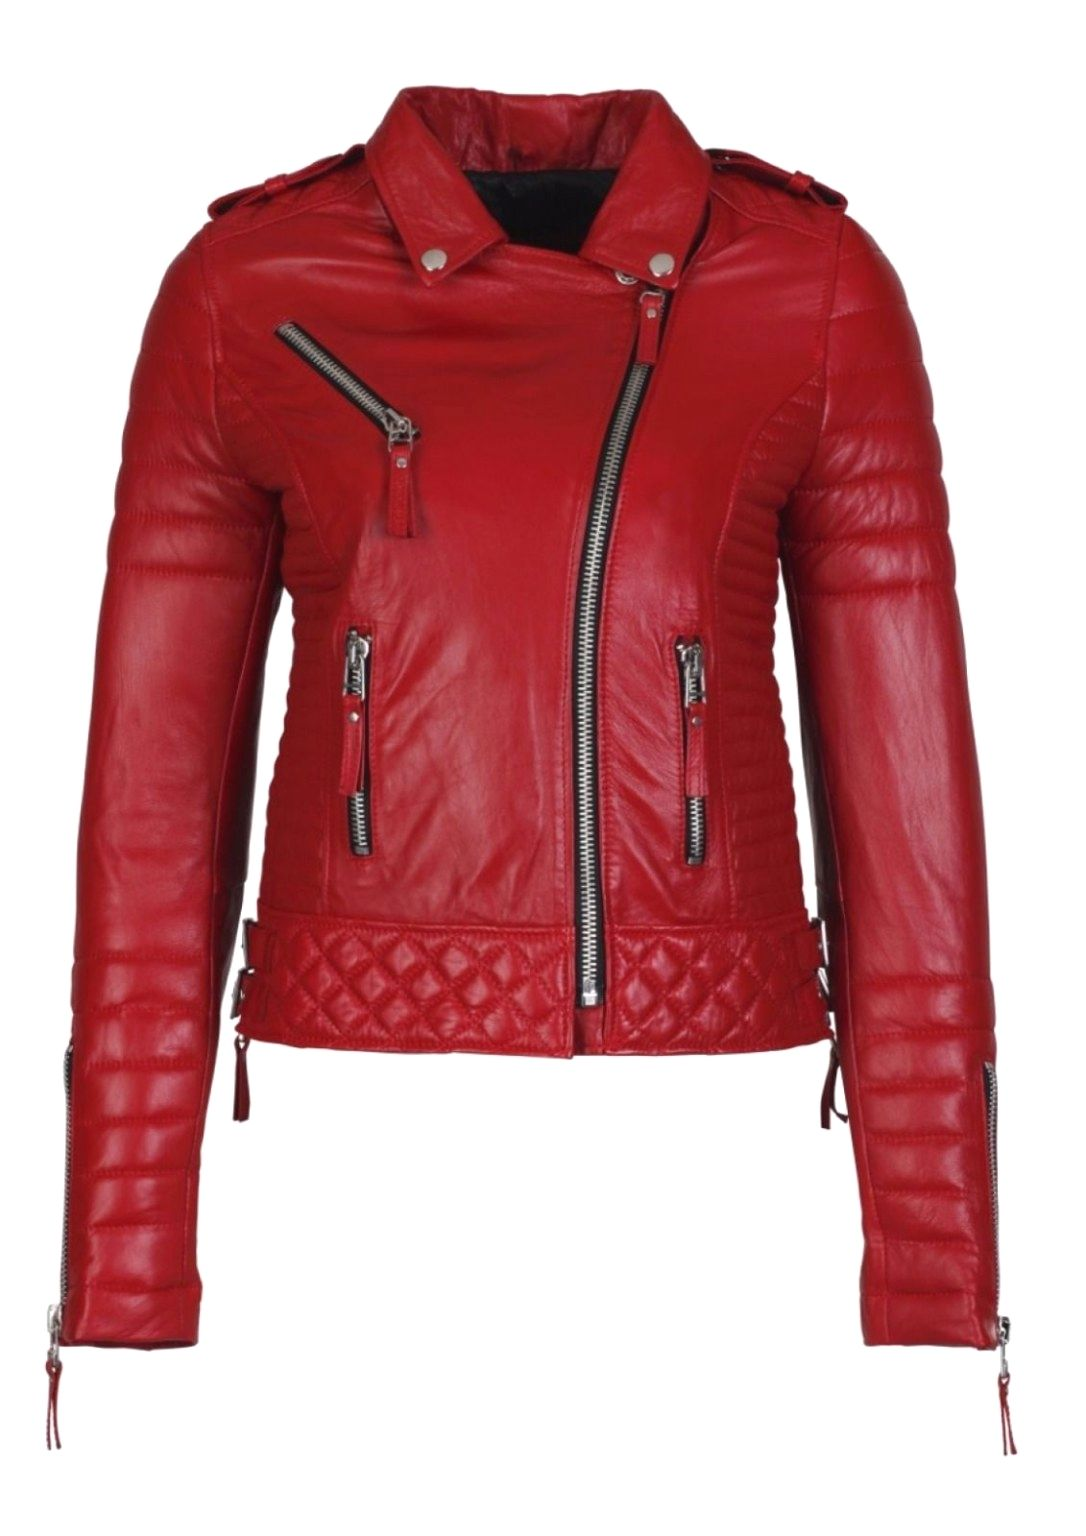 a75fa7da3b7 Men s Jacket Seasonal Womens Black Leather Jacket